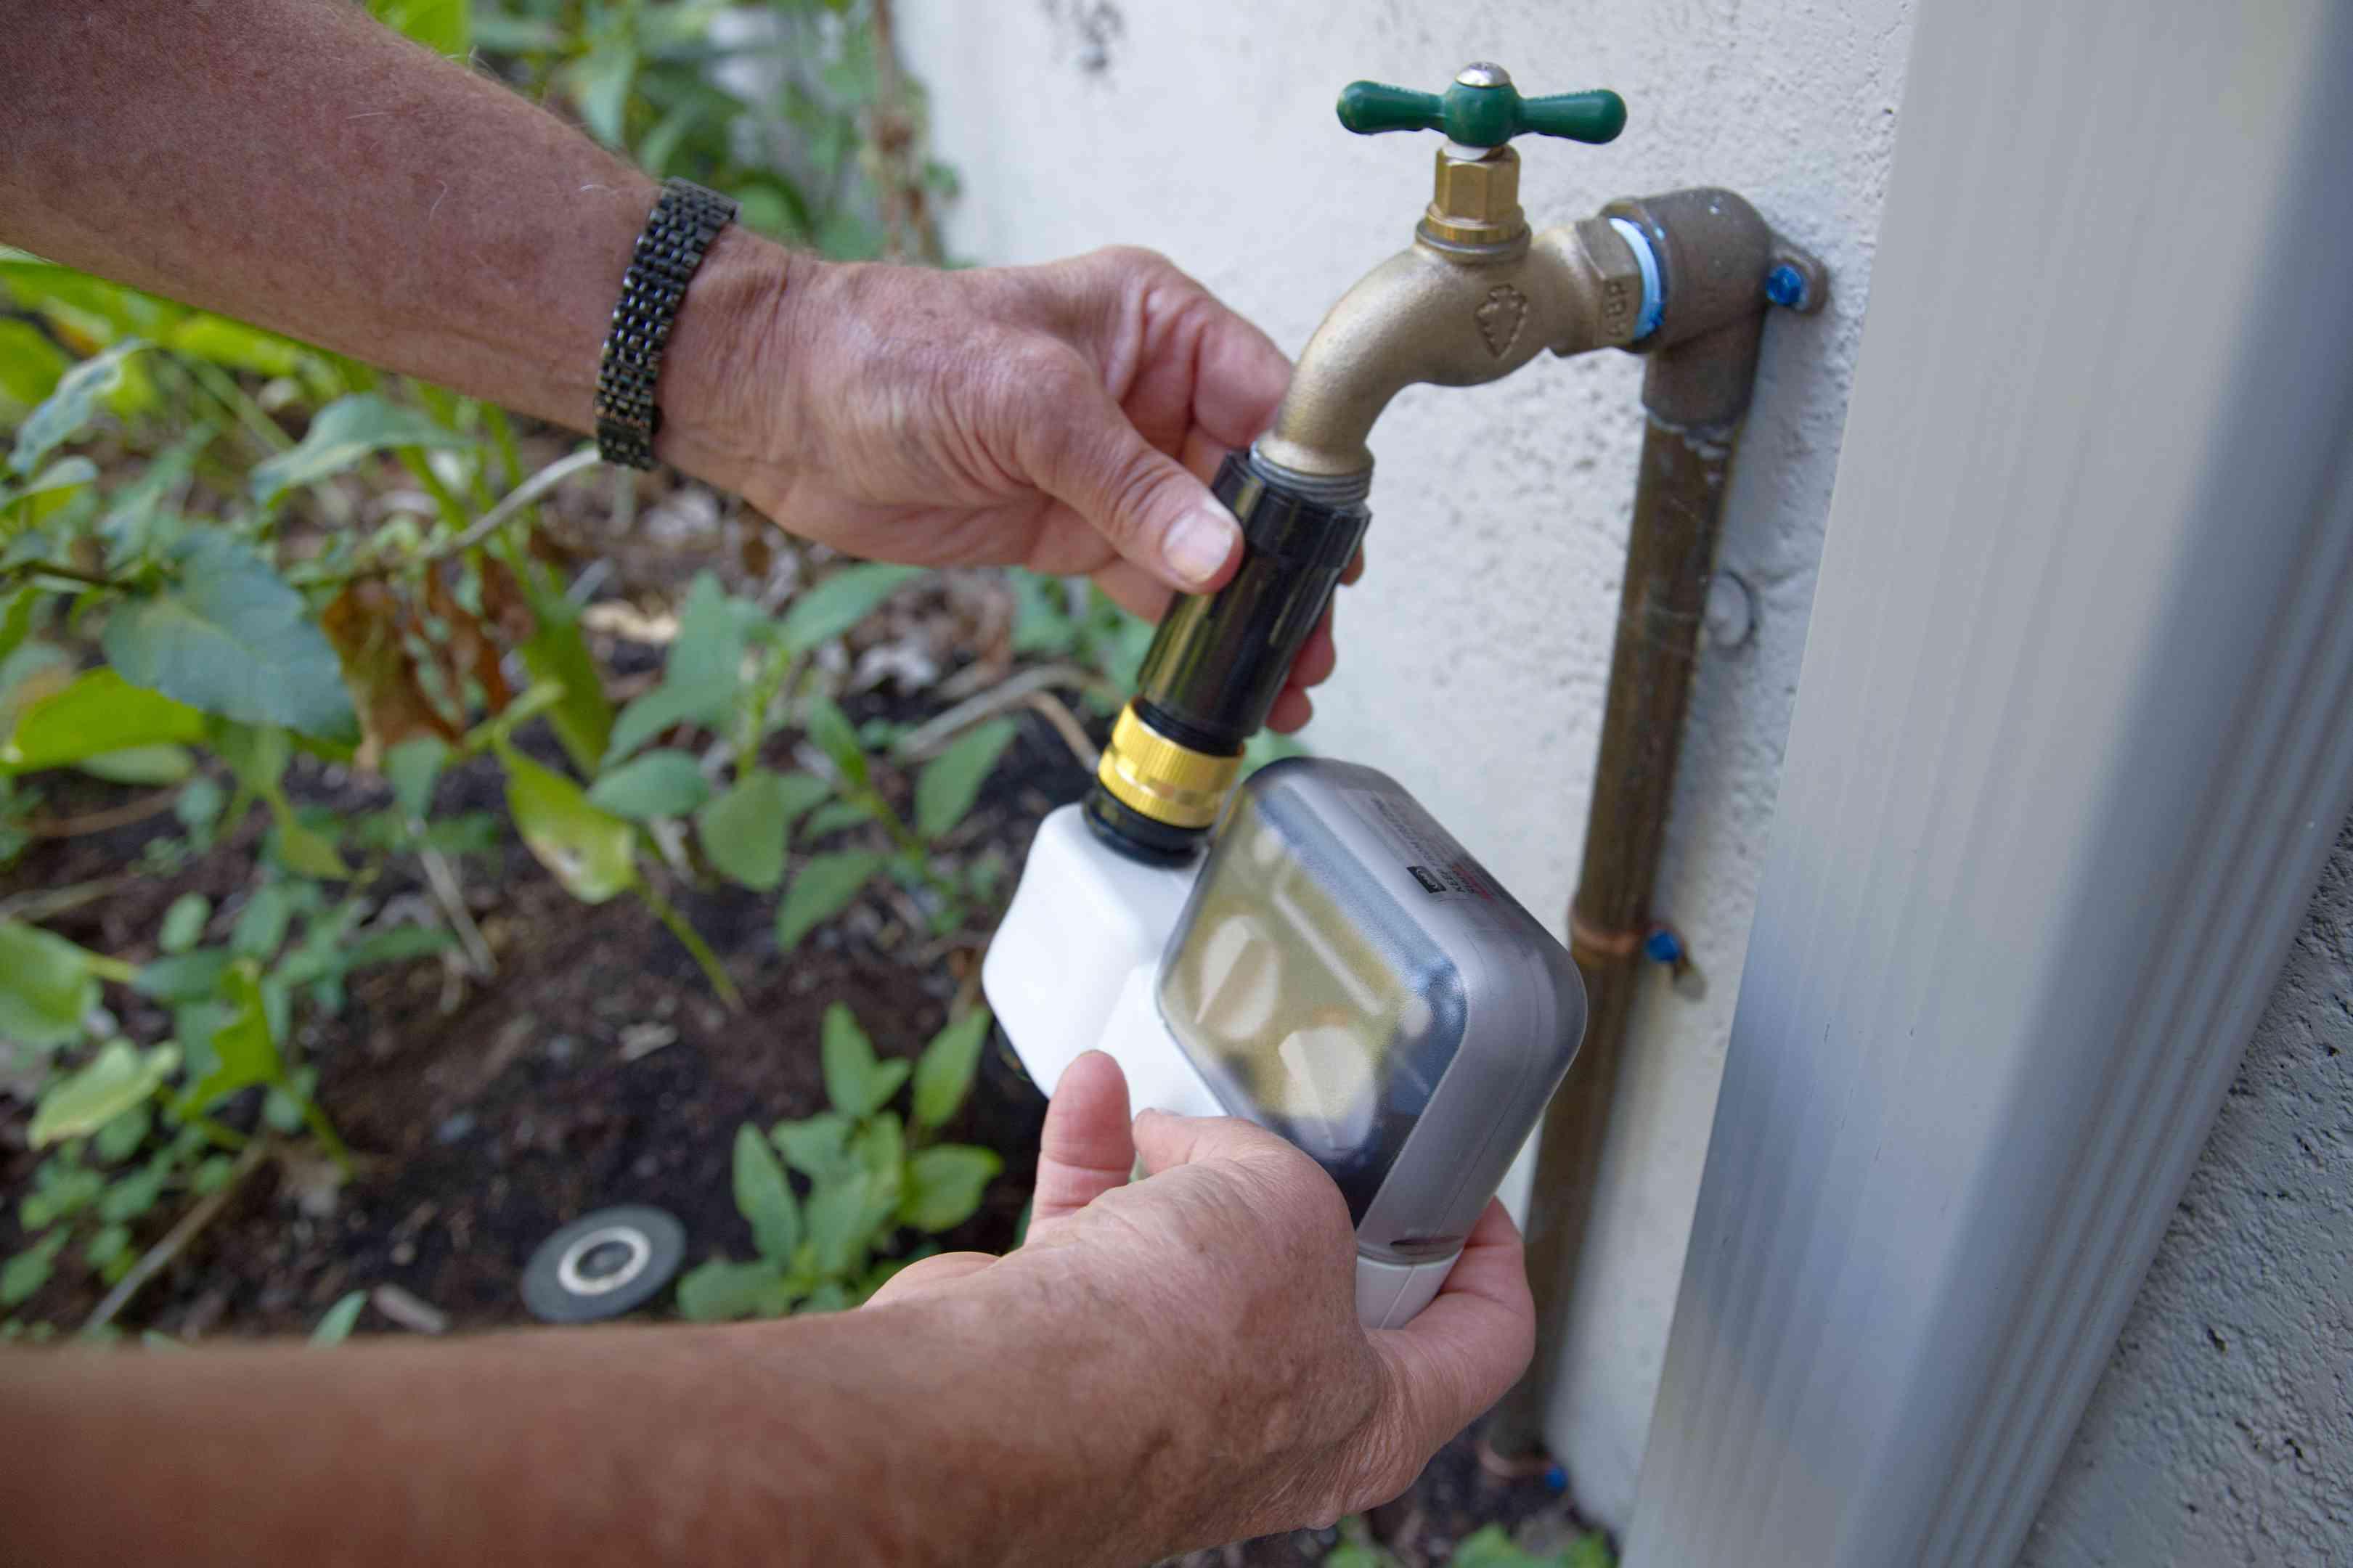 hands attach a timer and pressure regulator to the main hose line